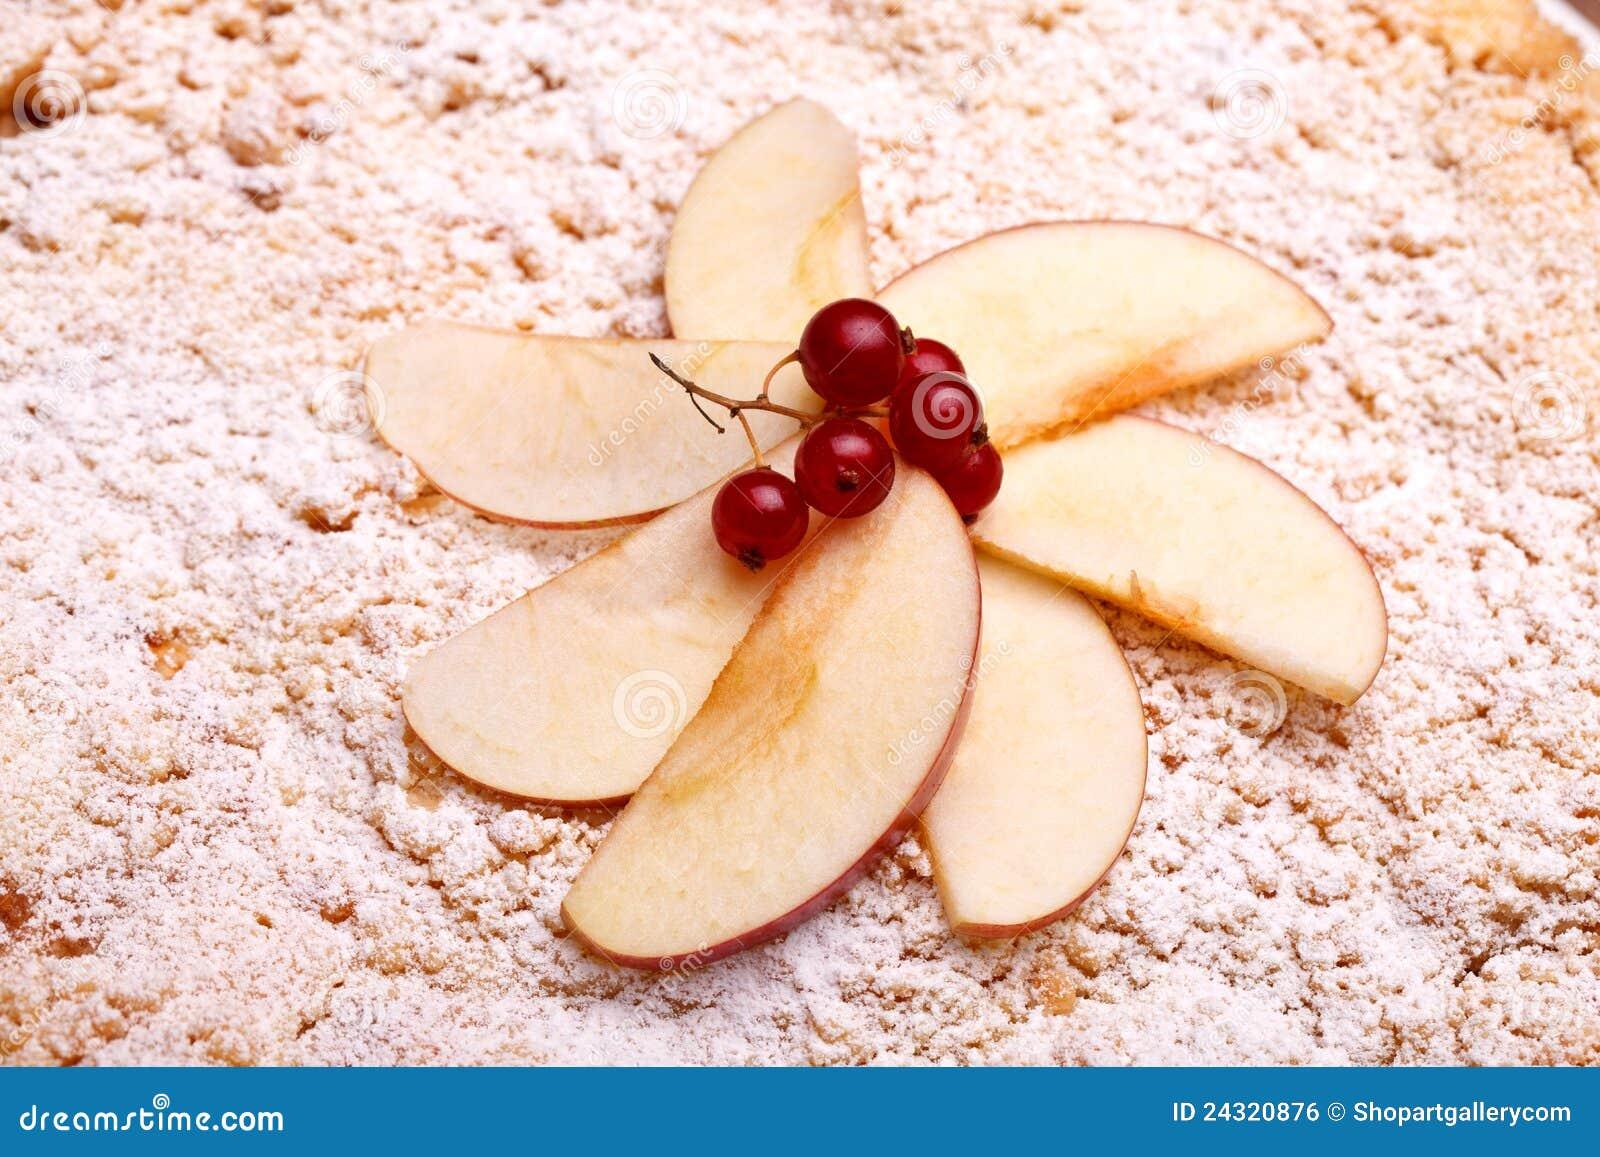 Decoration On Top Of Apple Cake Stock Photo - Image of international on